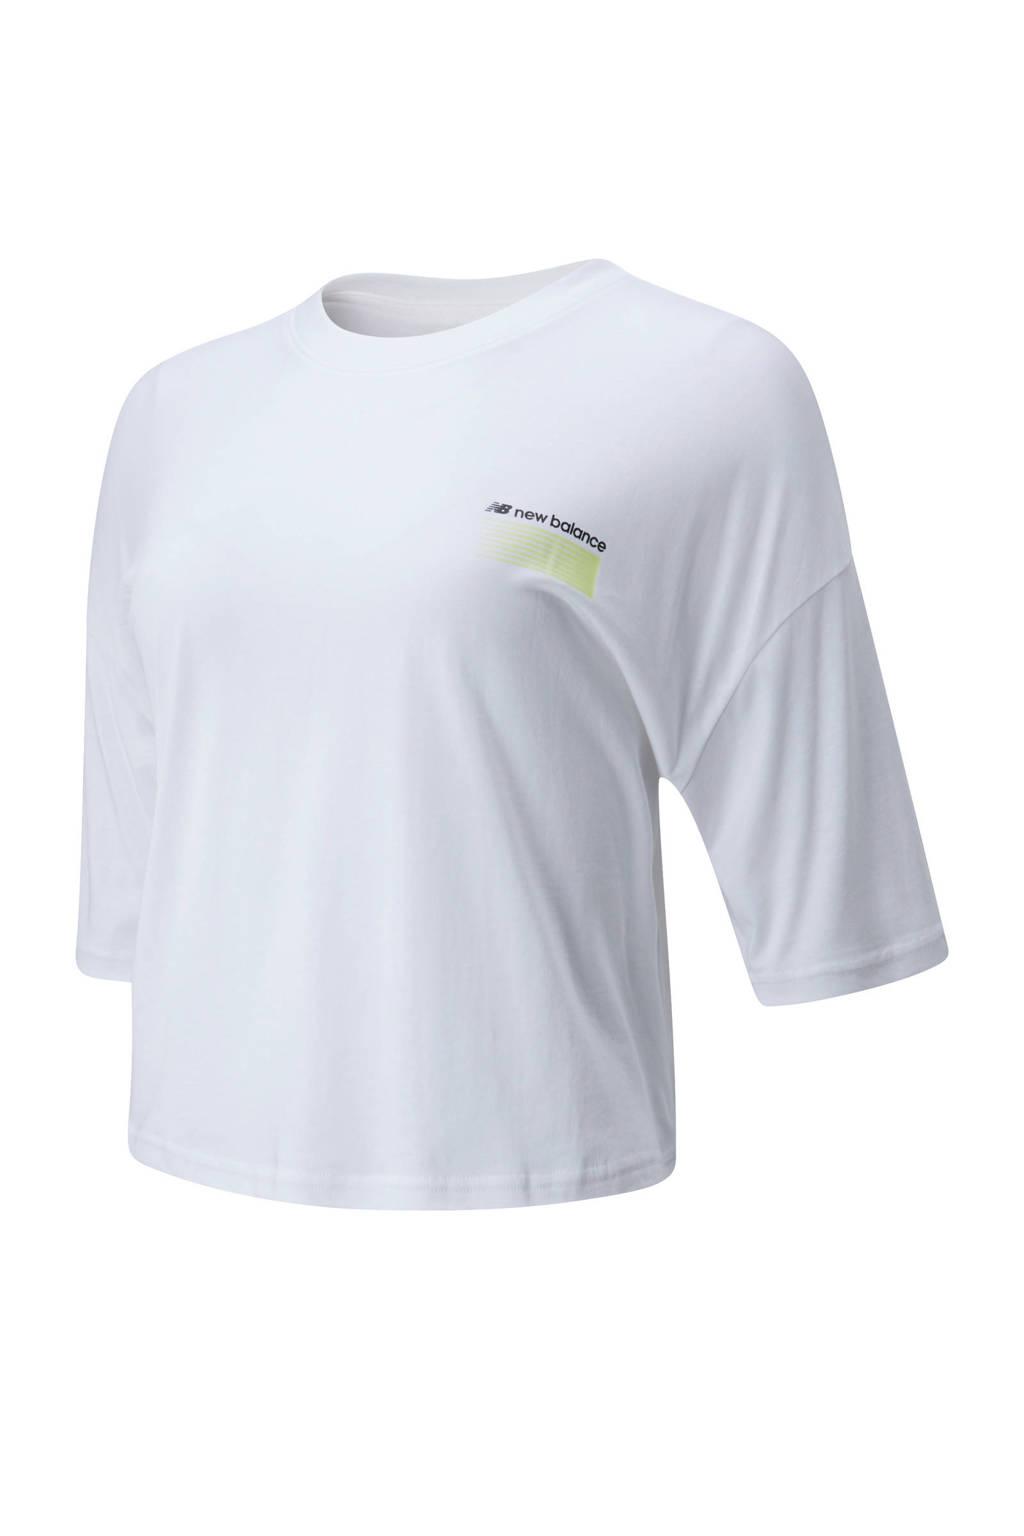 New Balance cropped T-shirt wit, Wit